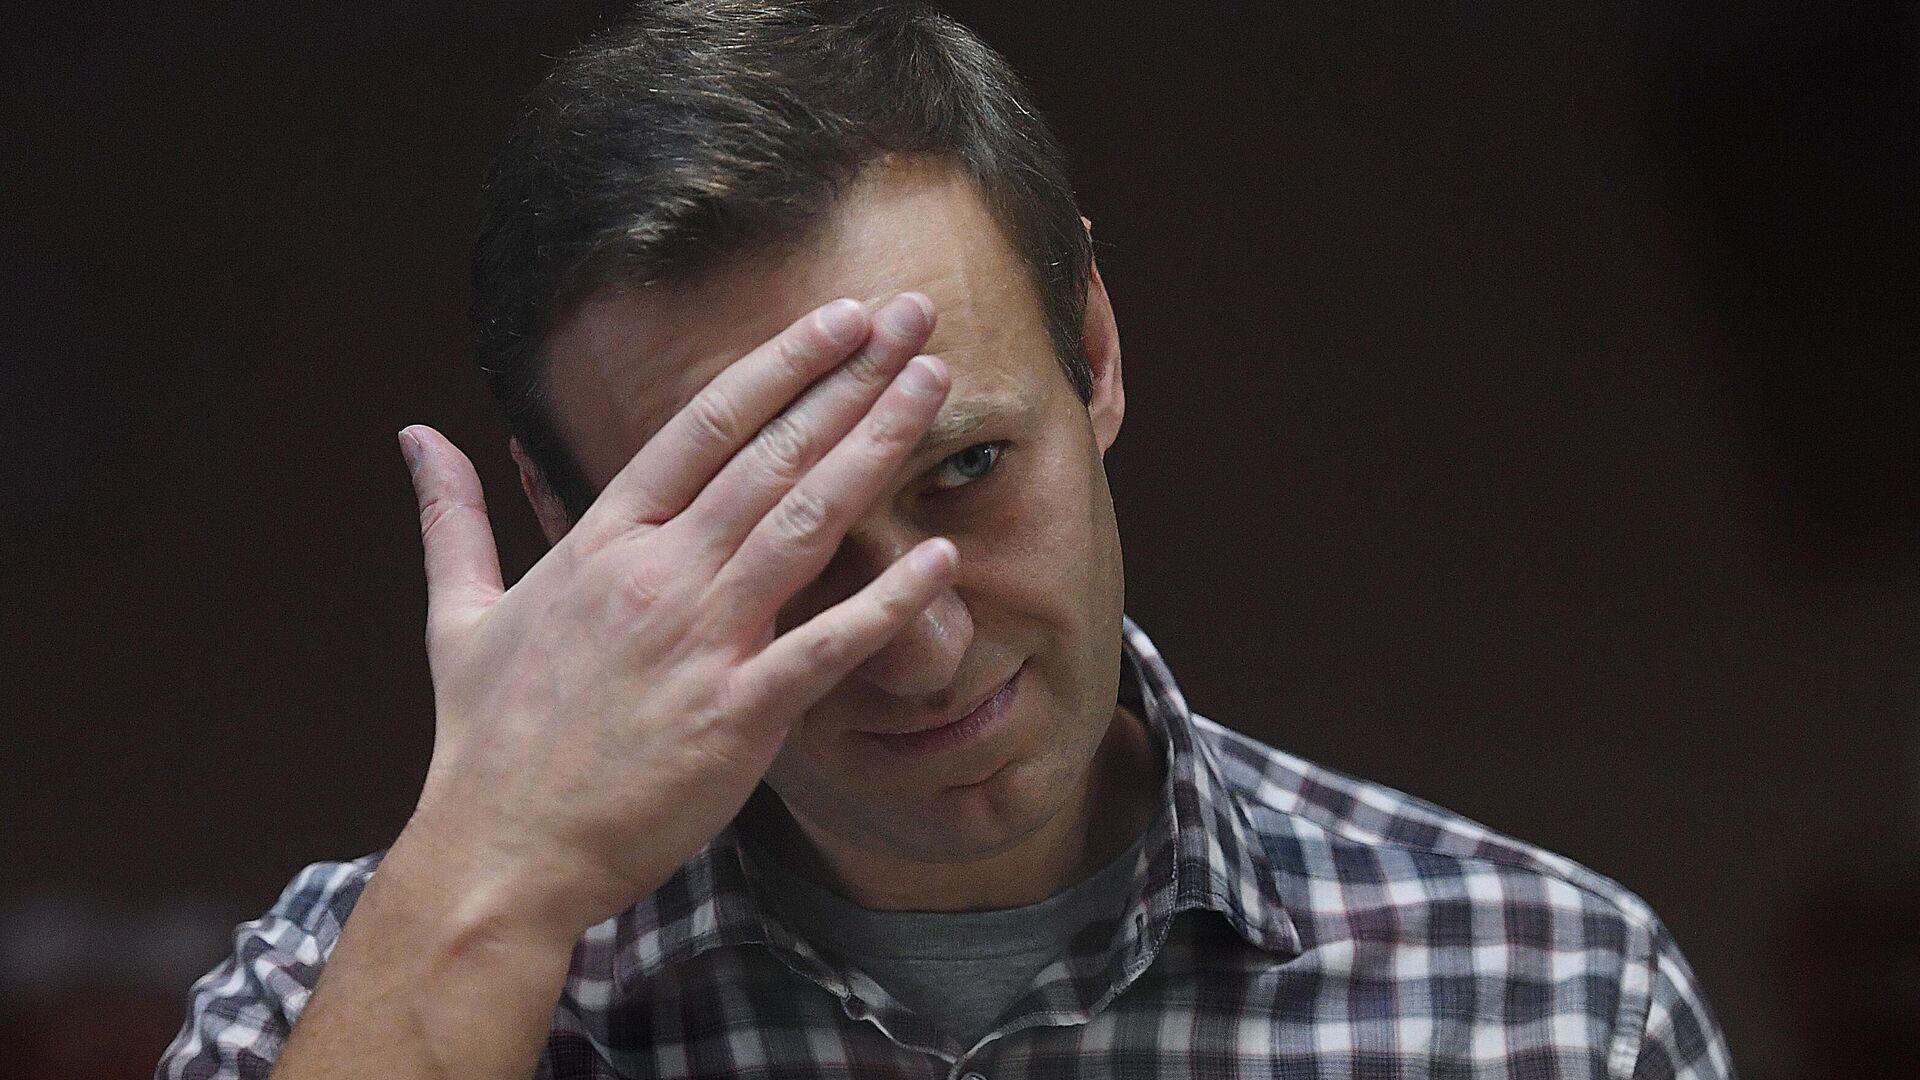 Alexéi Navalni, bloguero opositor ruso - Sputnik Mundo, 1920, 20.02.2021